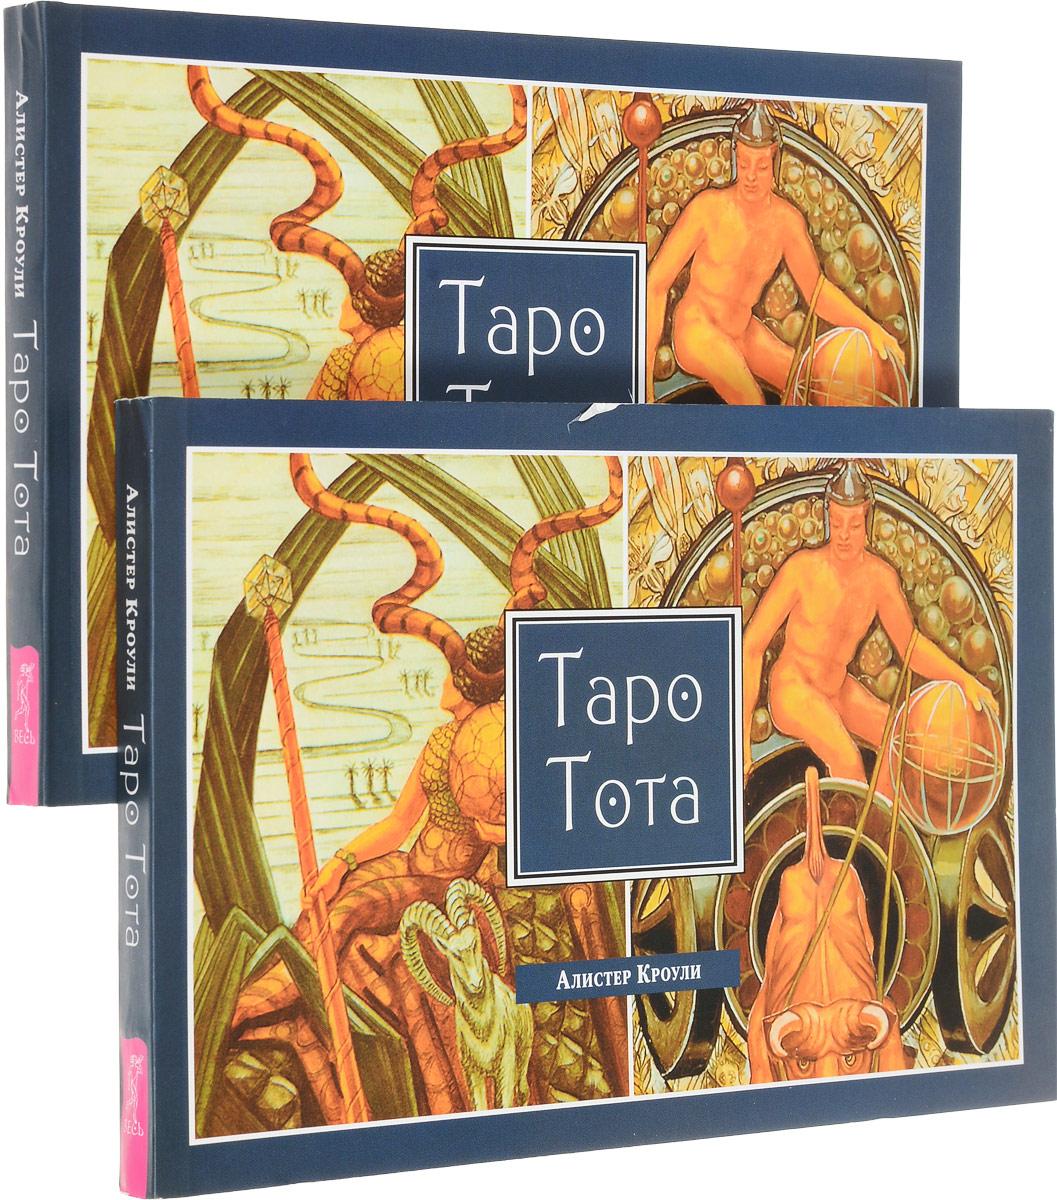 Алистер Кроули. Таро Тота (комплект из 2 книг). Х. Банцхаф, Акрон, Б. Телер